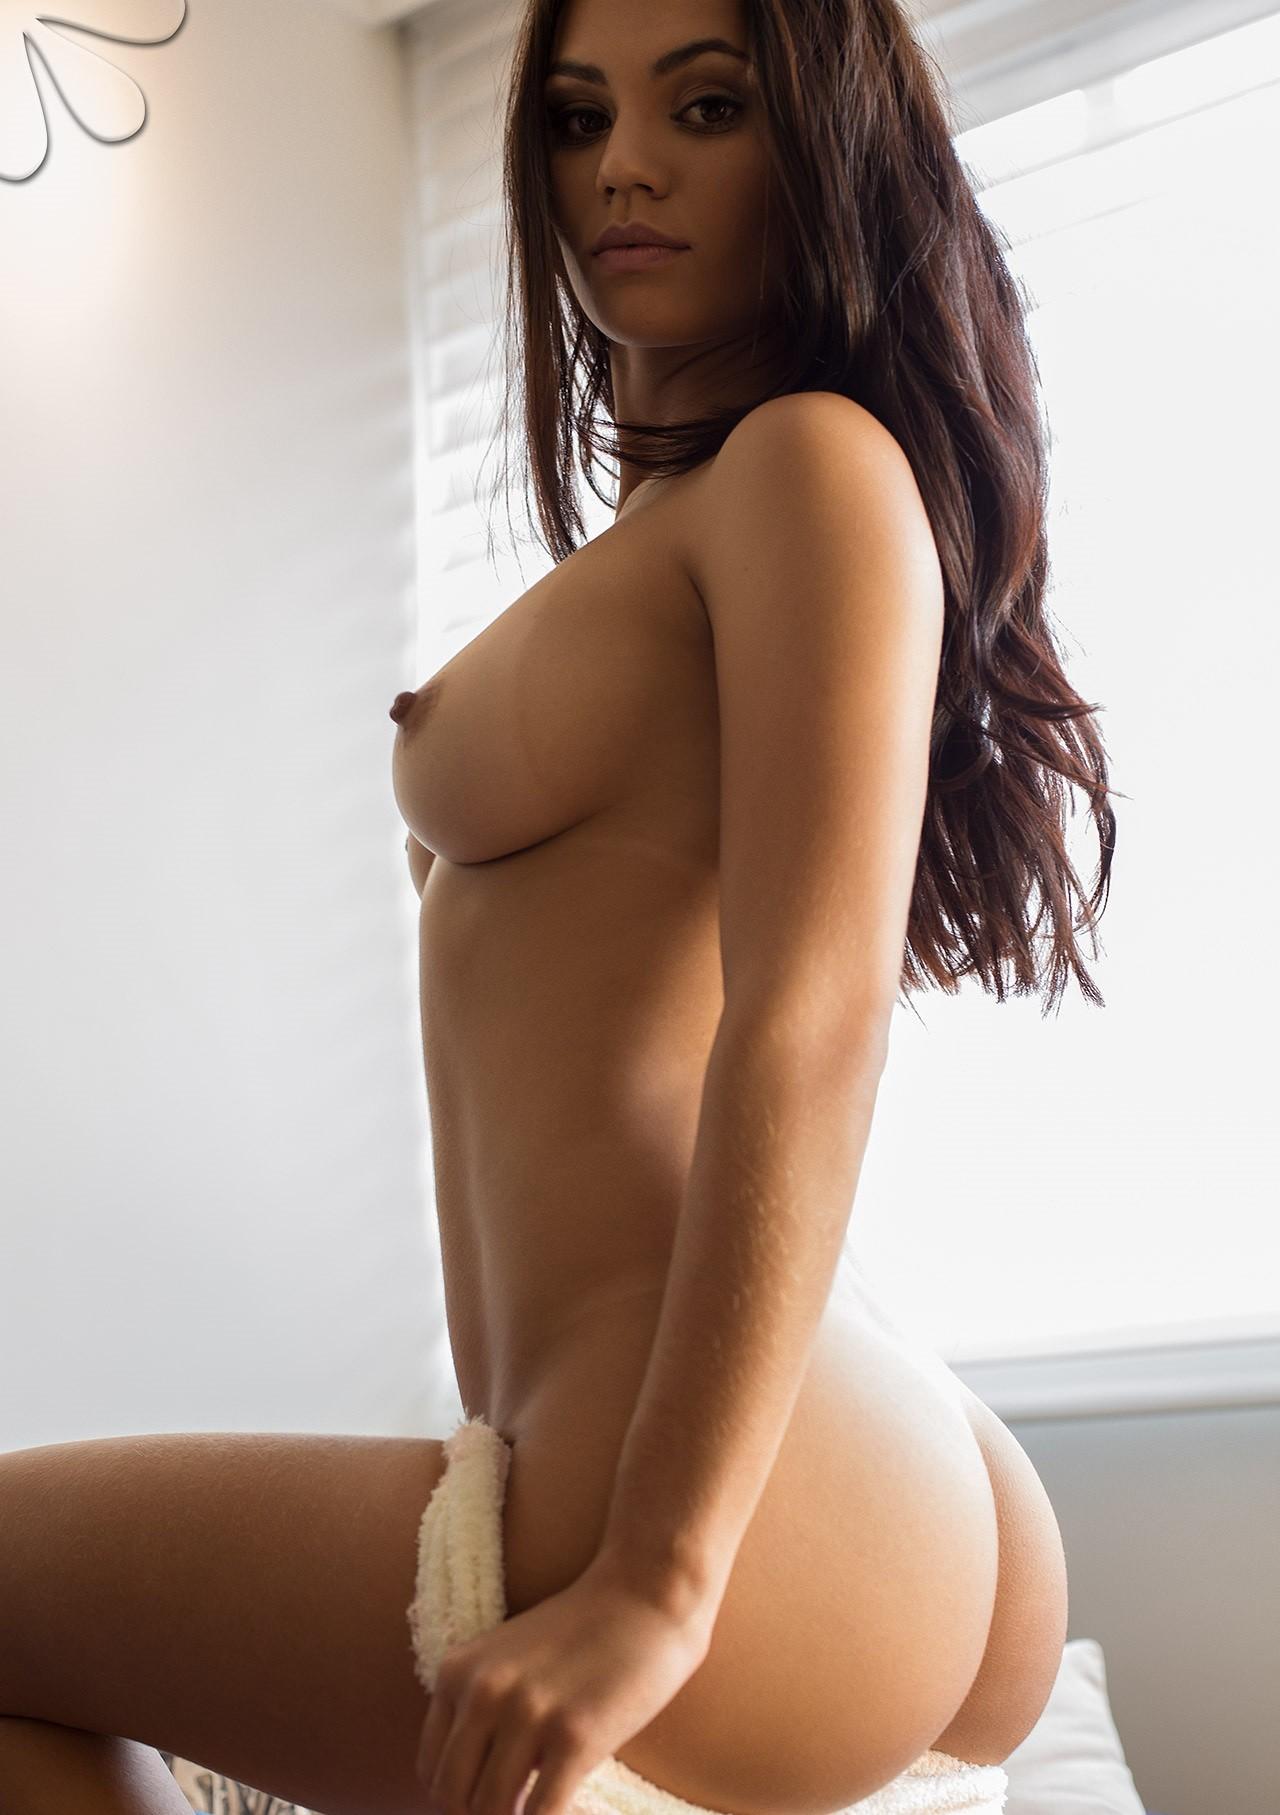 francielli-fontana-nude-brazilian-black-lingerie-camera-bellada-semana-31